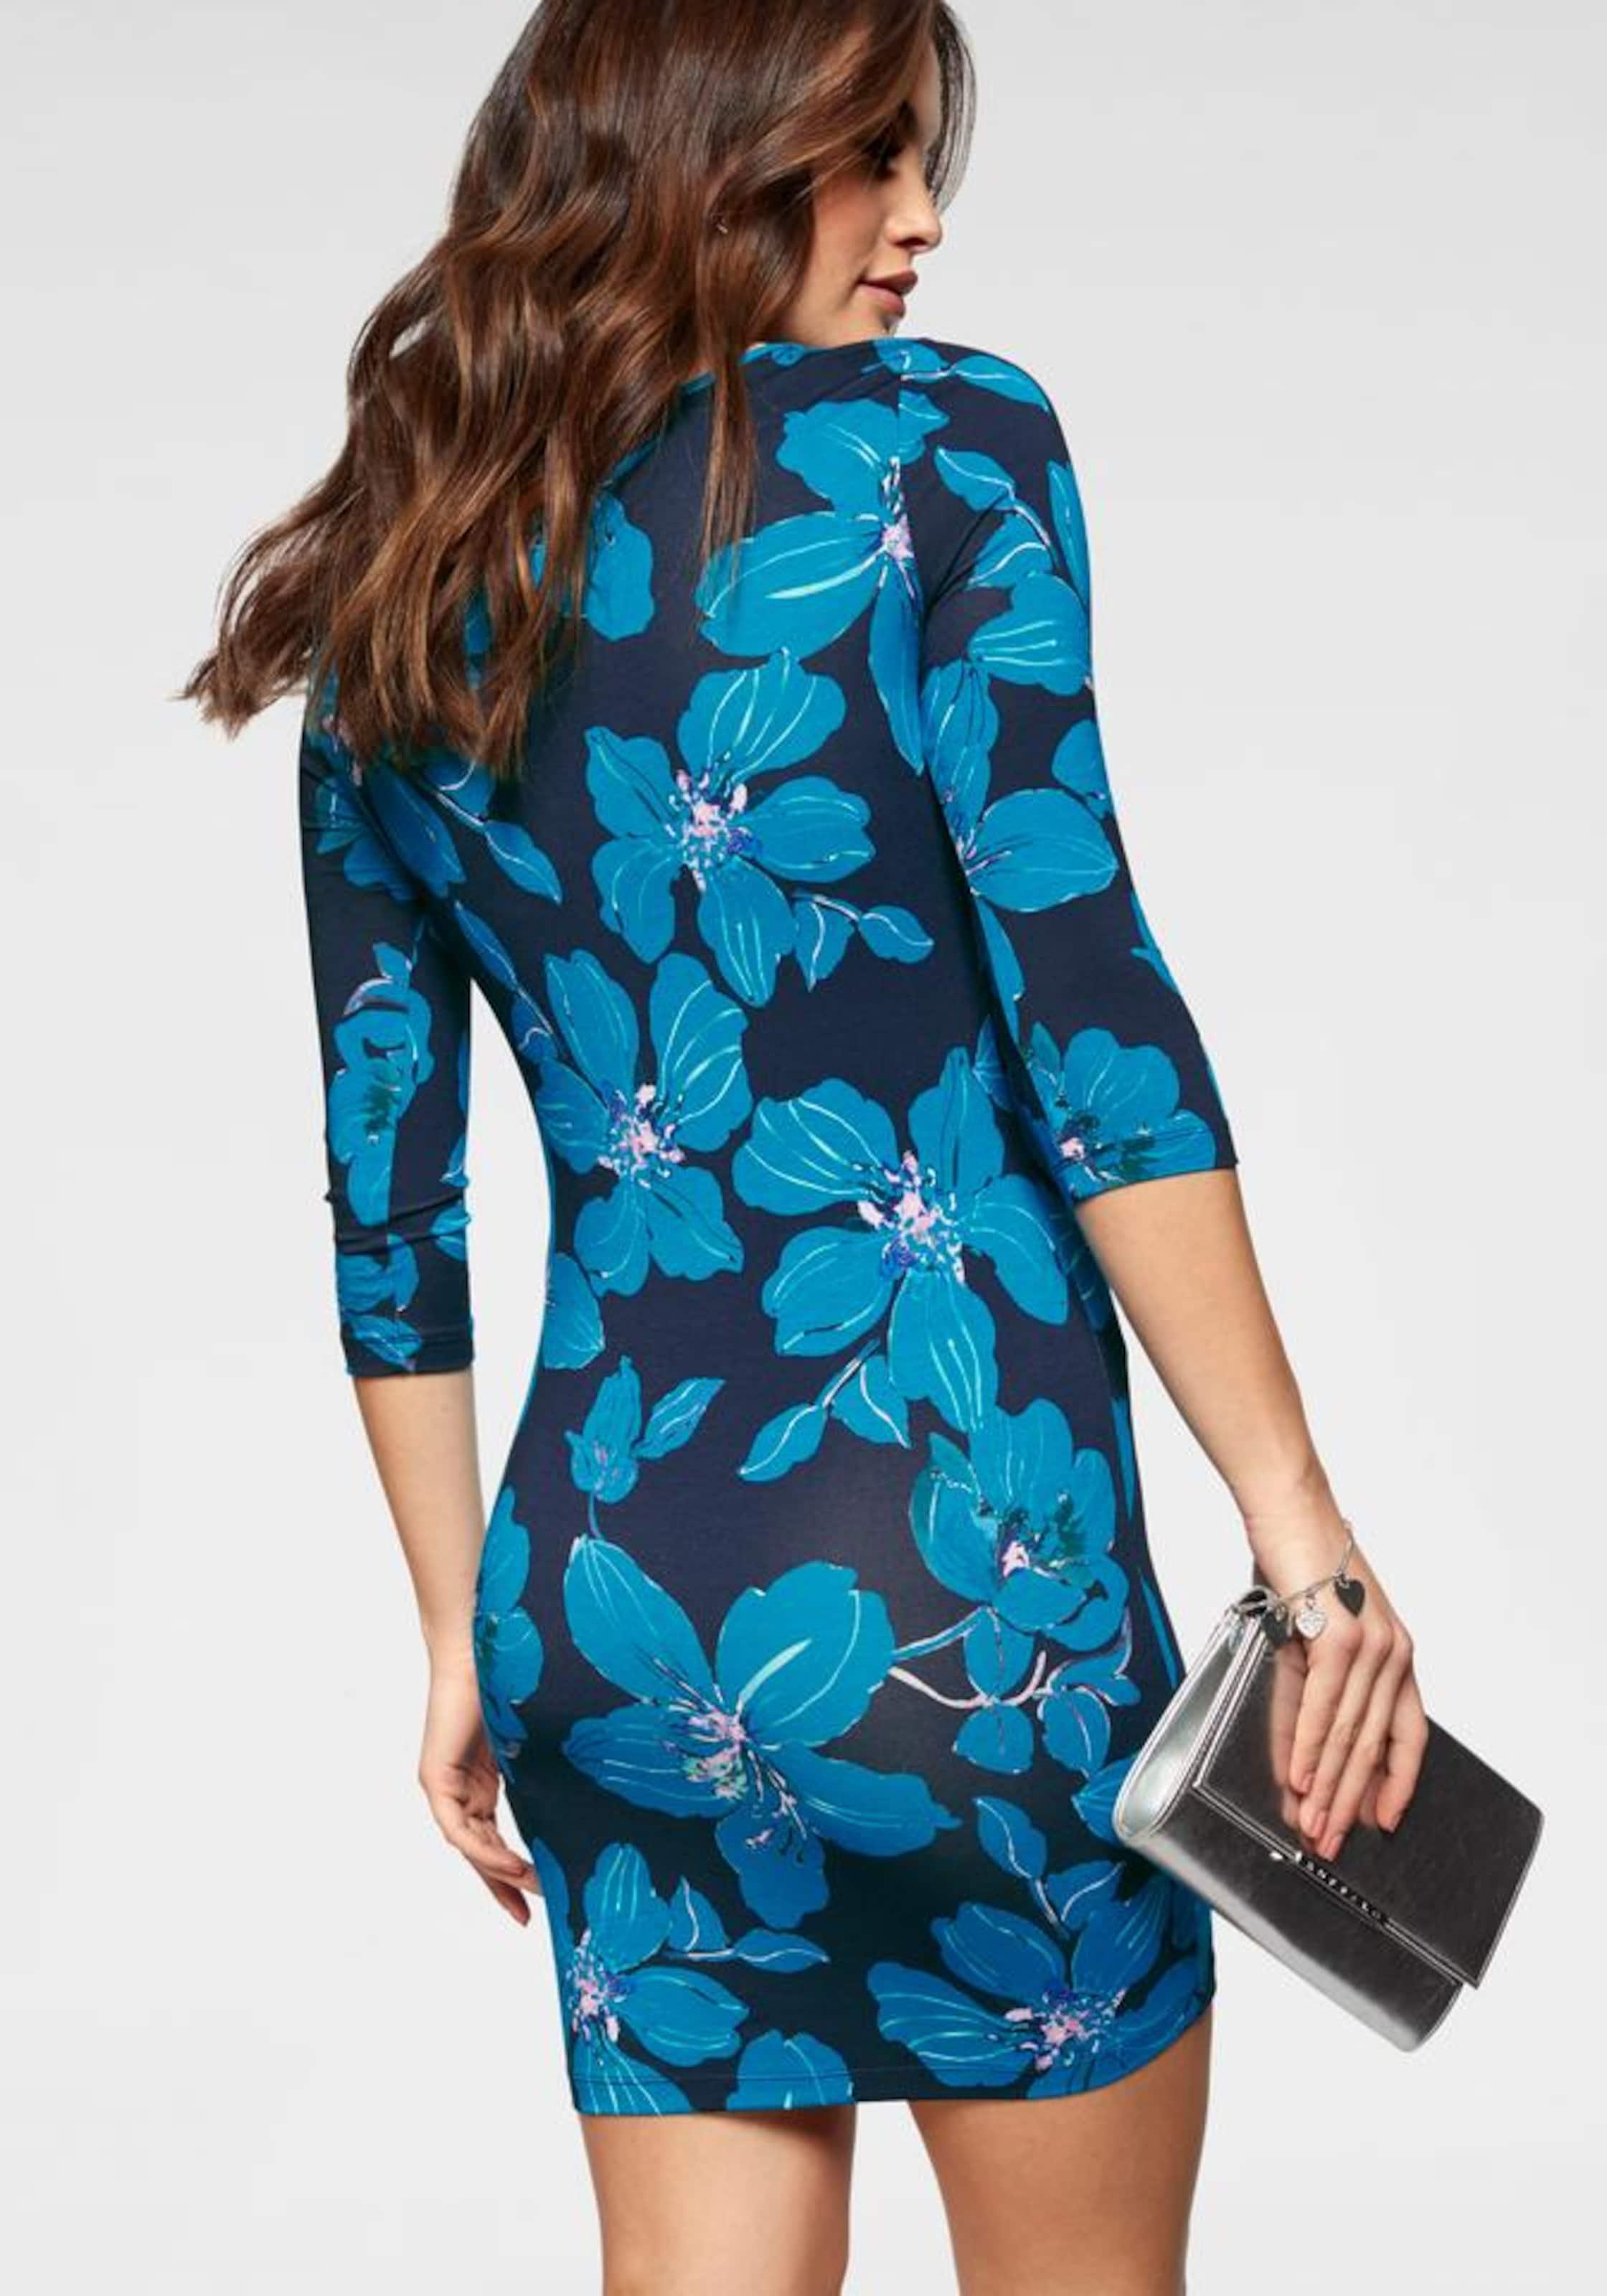 NachtblauRoyalblau In Kleid In Melrose Melrose Kleid NachtblauRoyalblau Melrose Ok8n0PwX